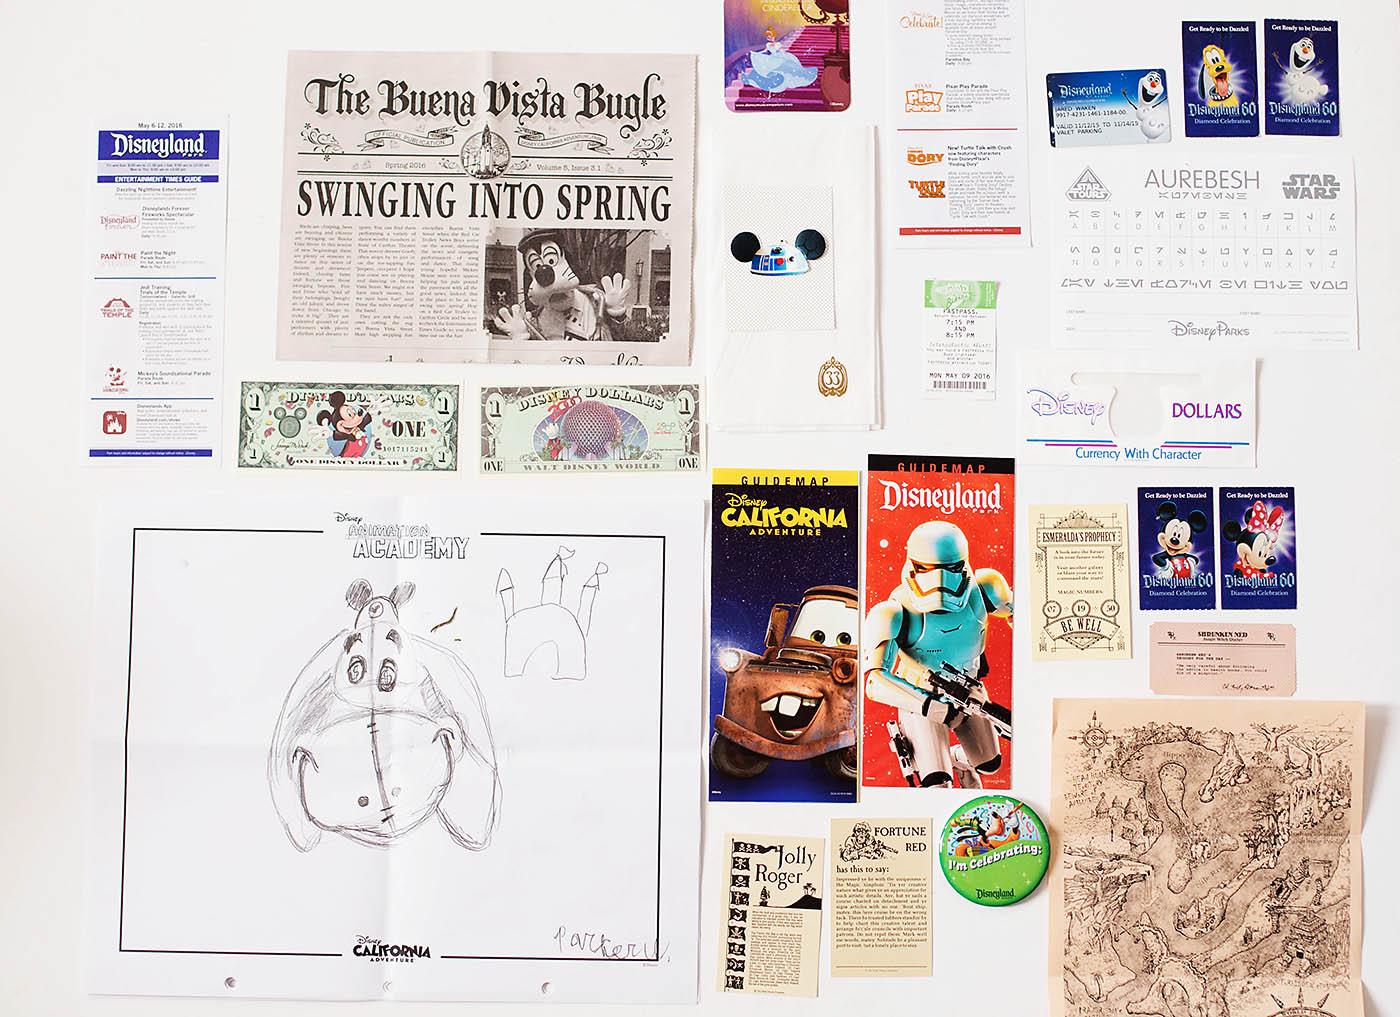 Memorabilia to collect at Disneyland